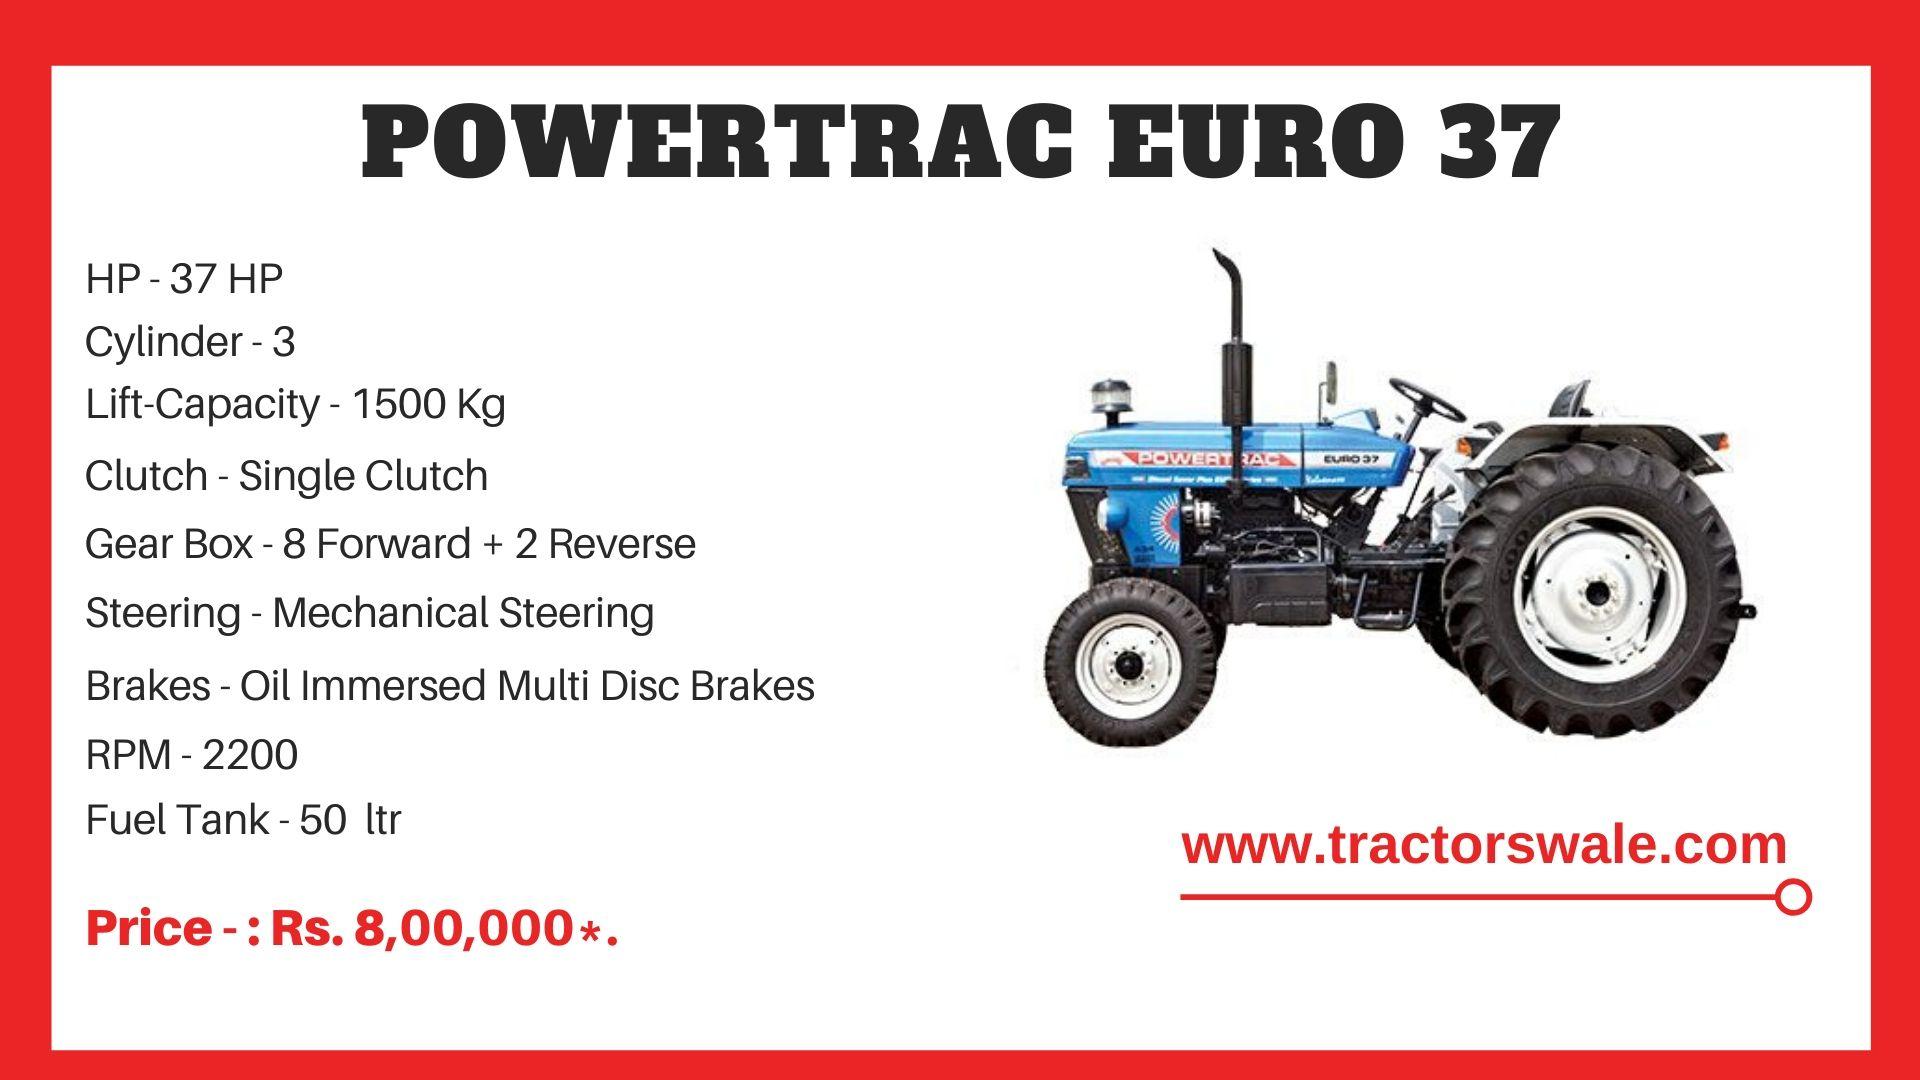 PowerTrac Euro 37 tractor price